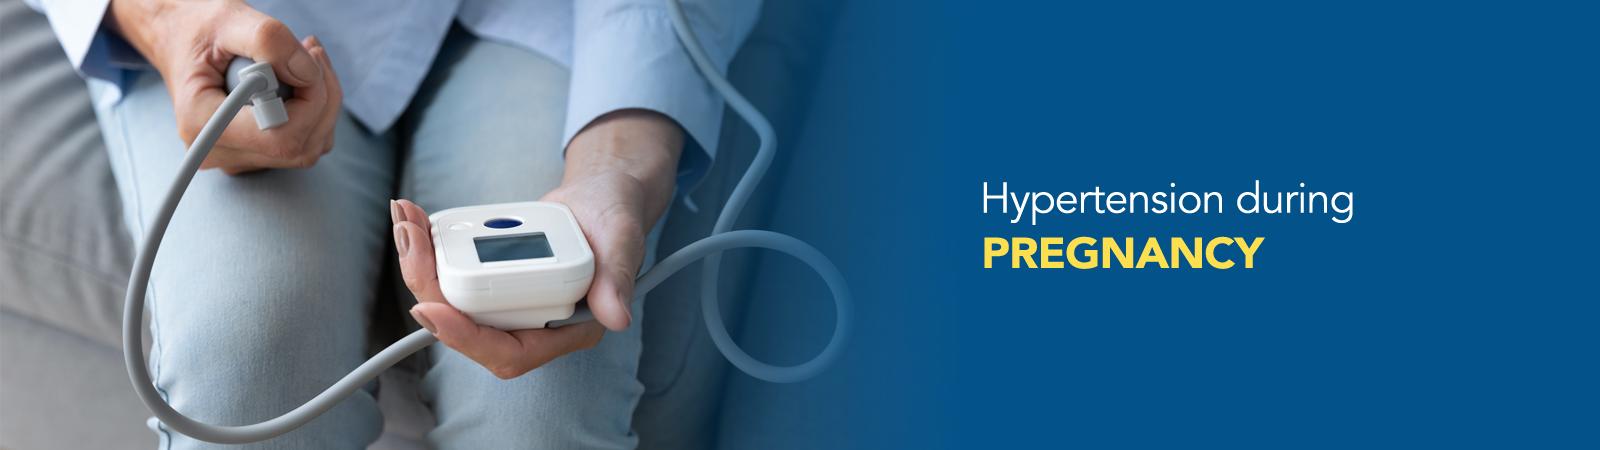 Hypertension During Pregnancy